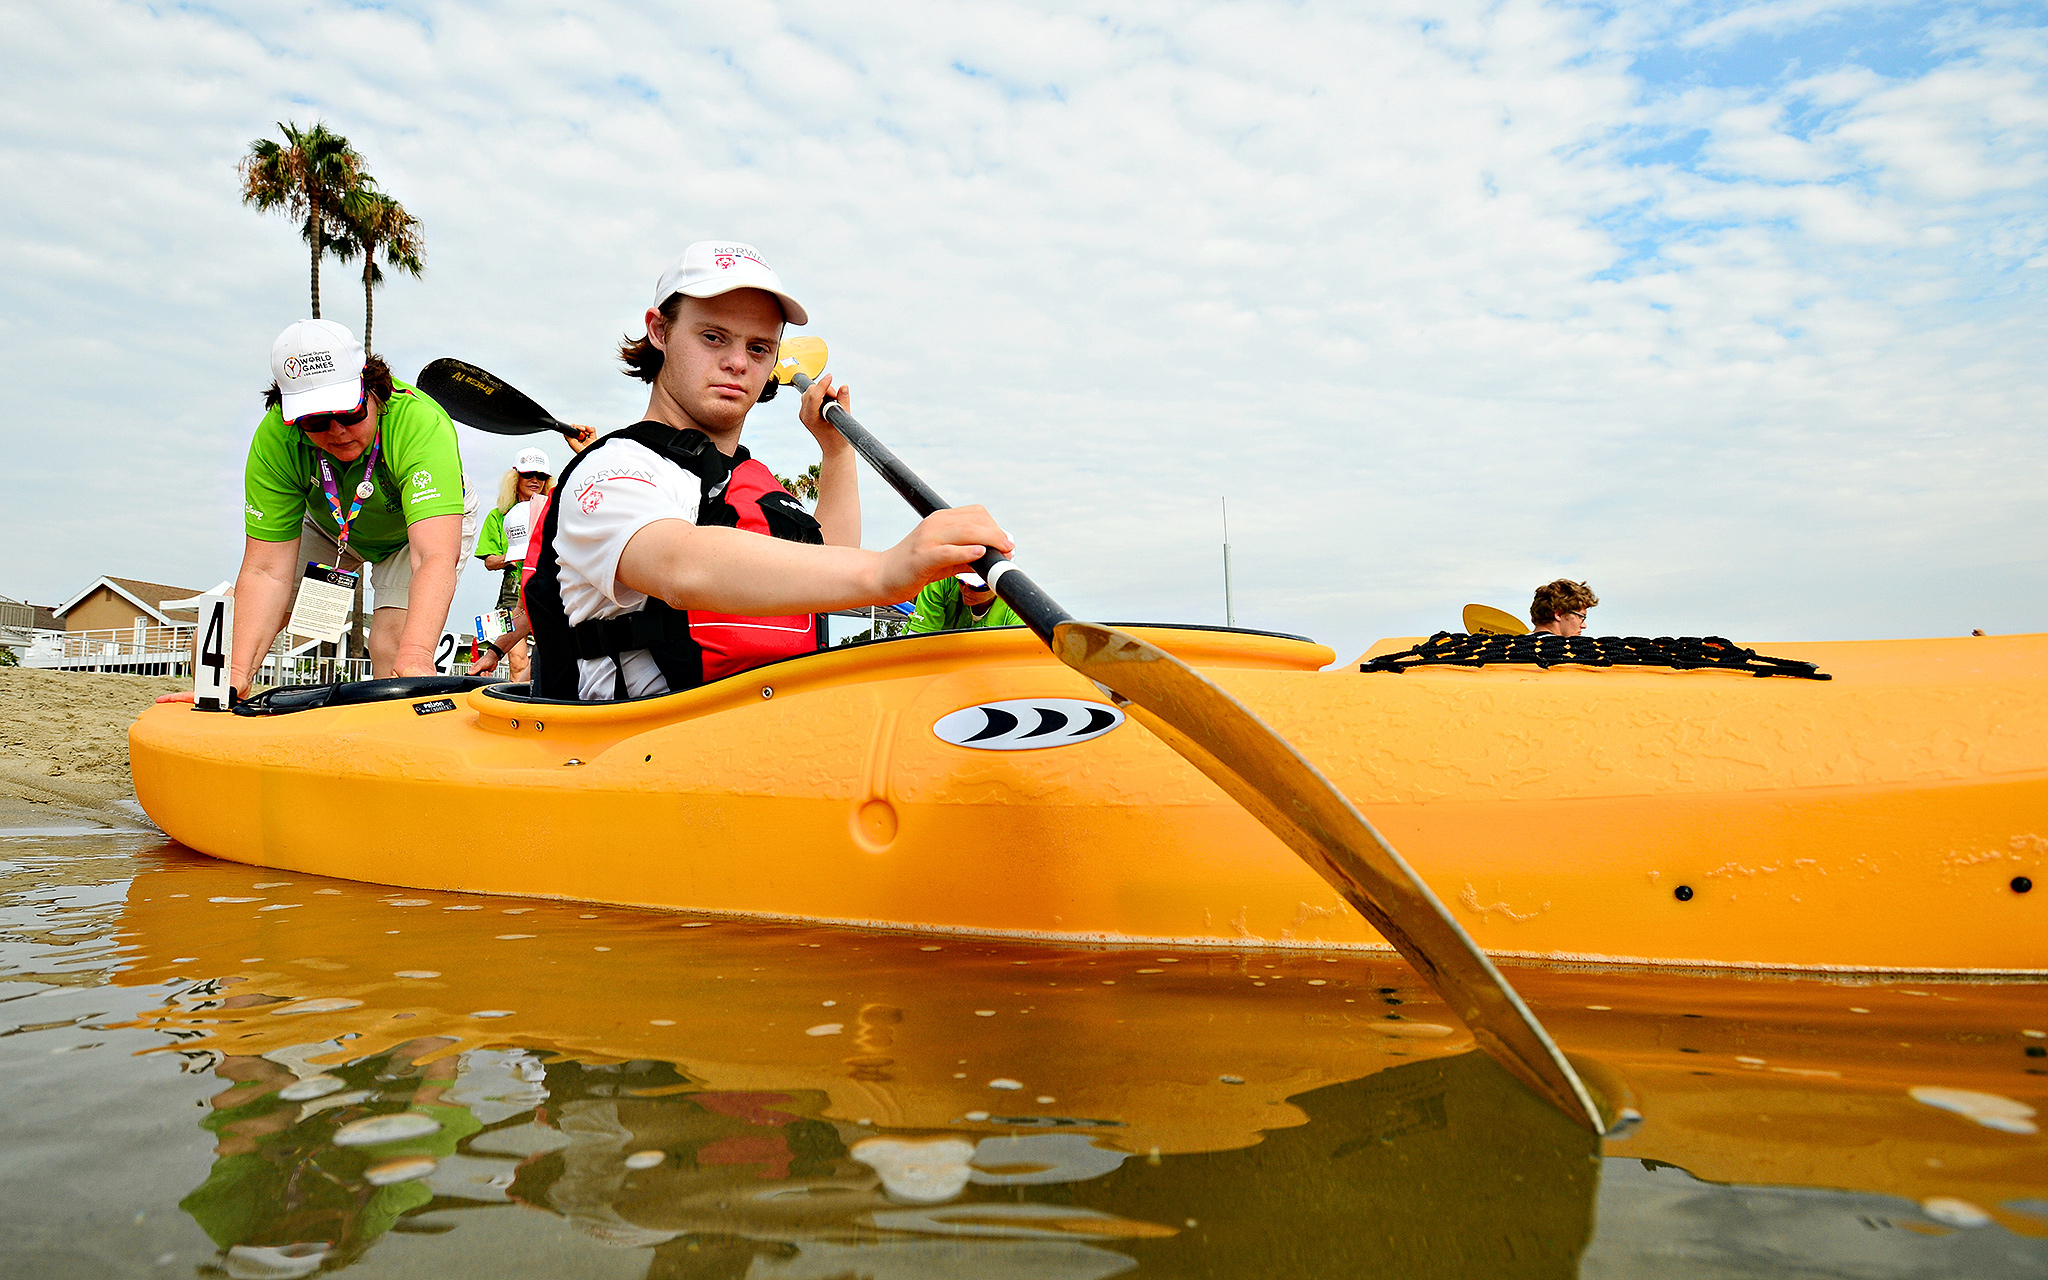 Kayak determination